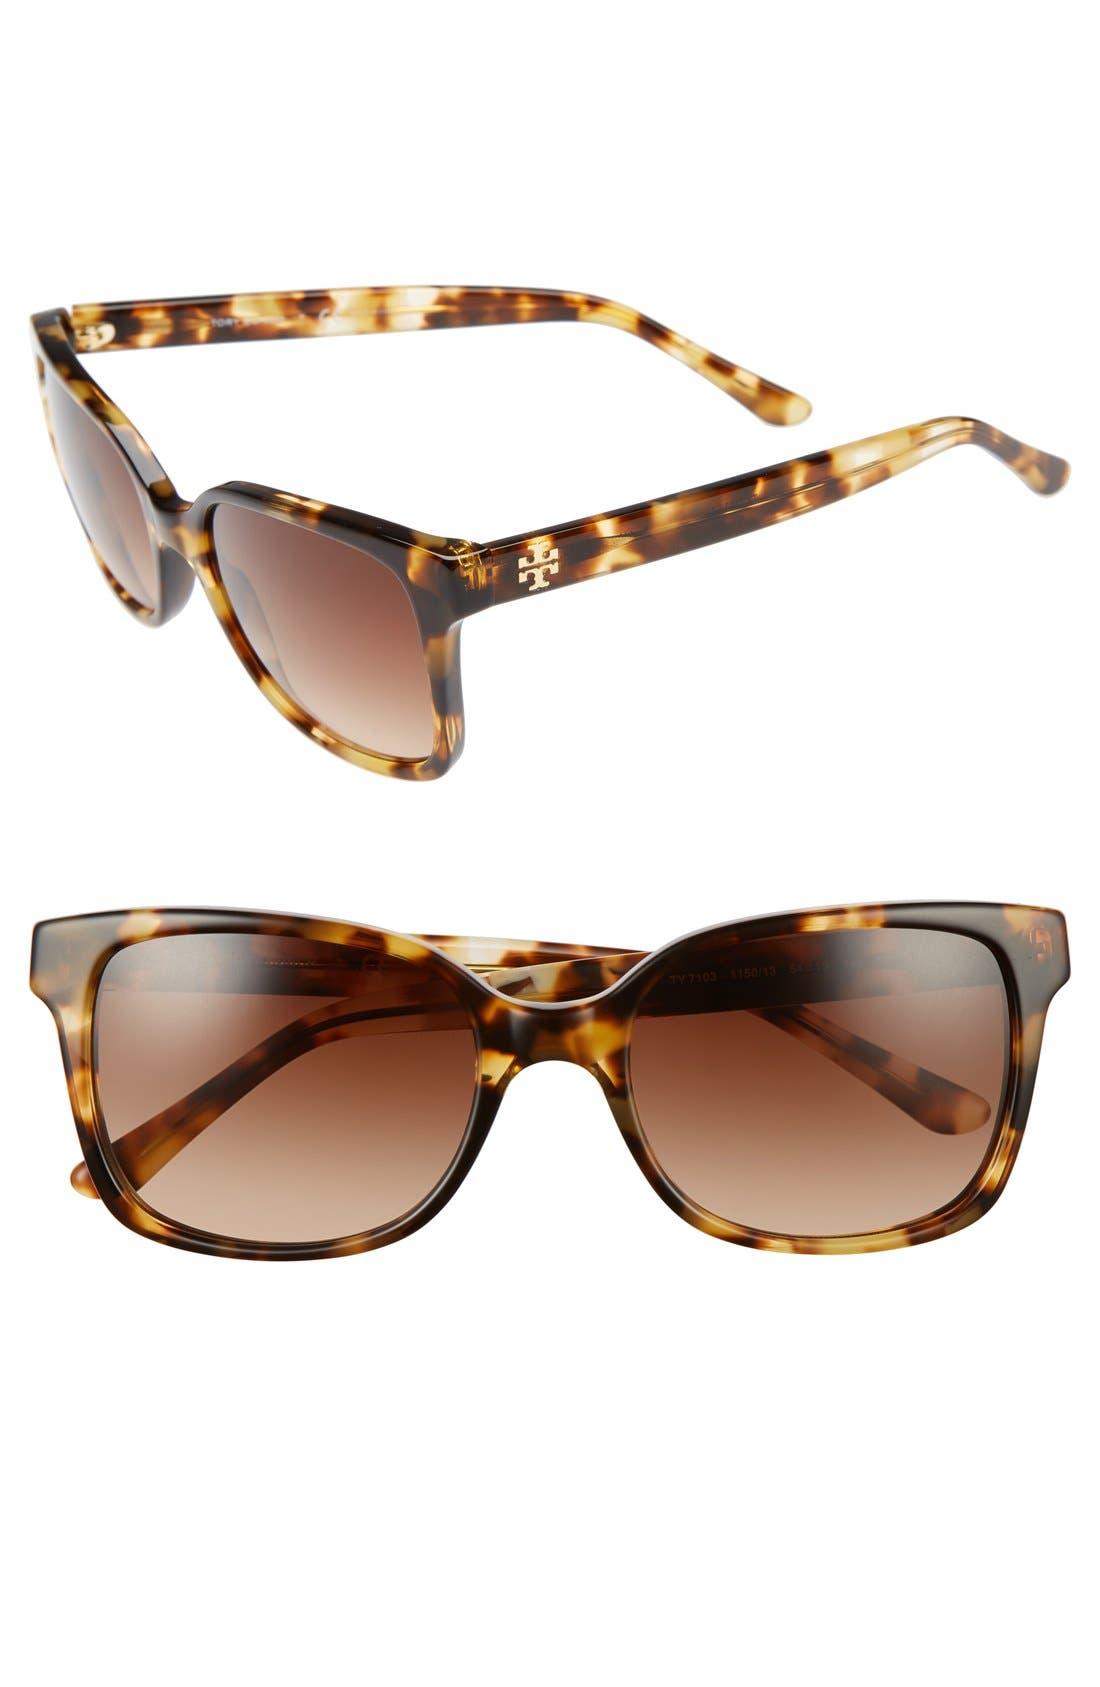 54mm Sunglasses,                         Main,                         color, LIGHT TORTOISE